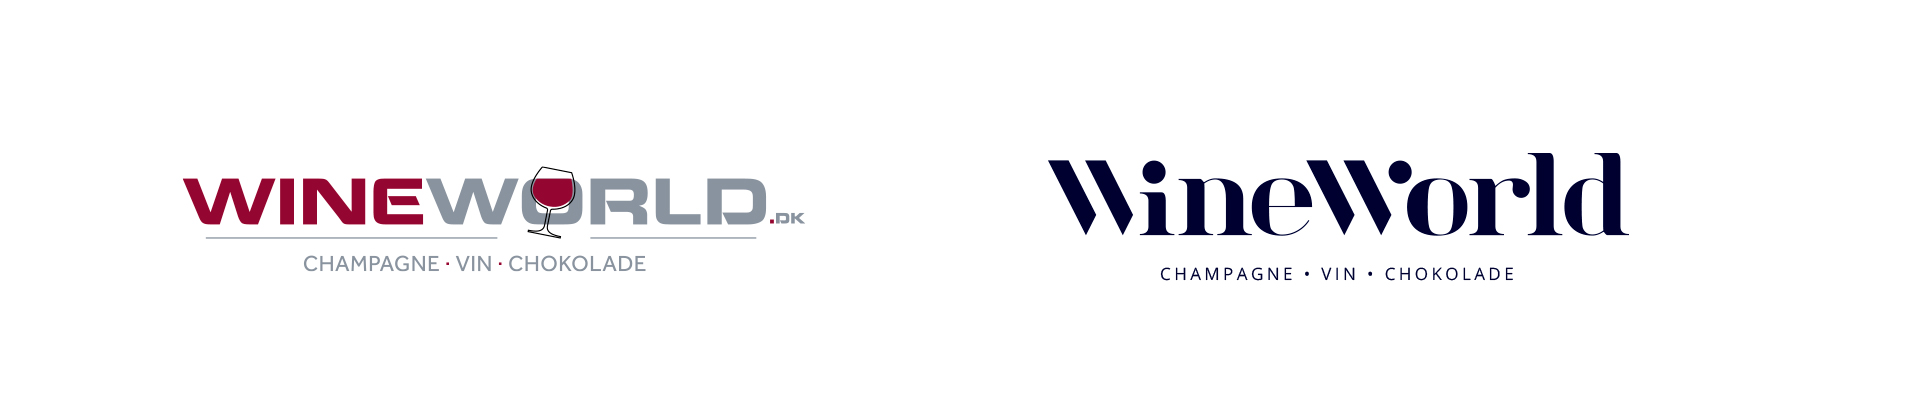 YourDesignMark-WineWorld-01